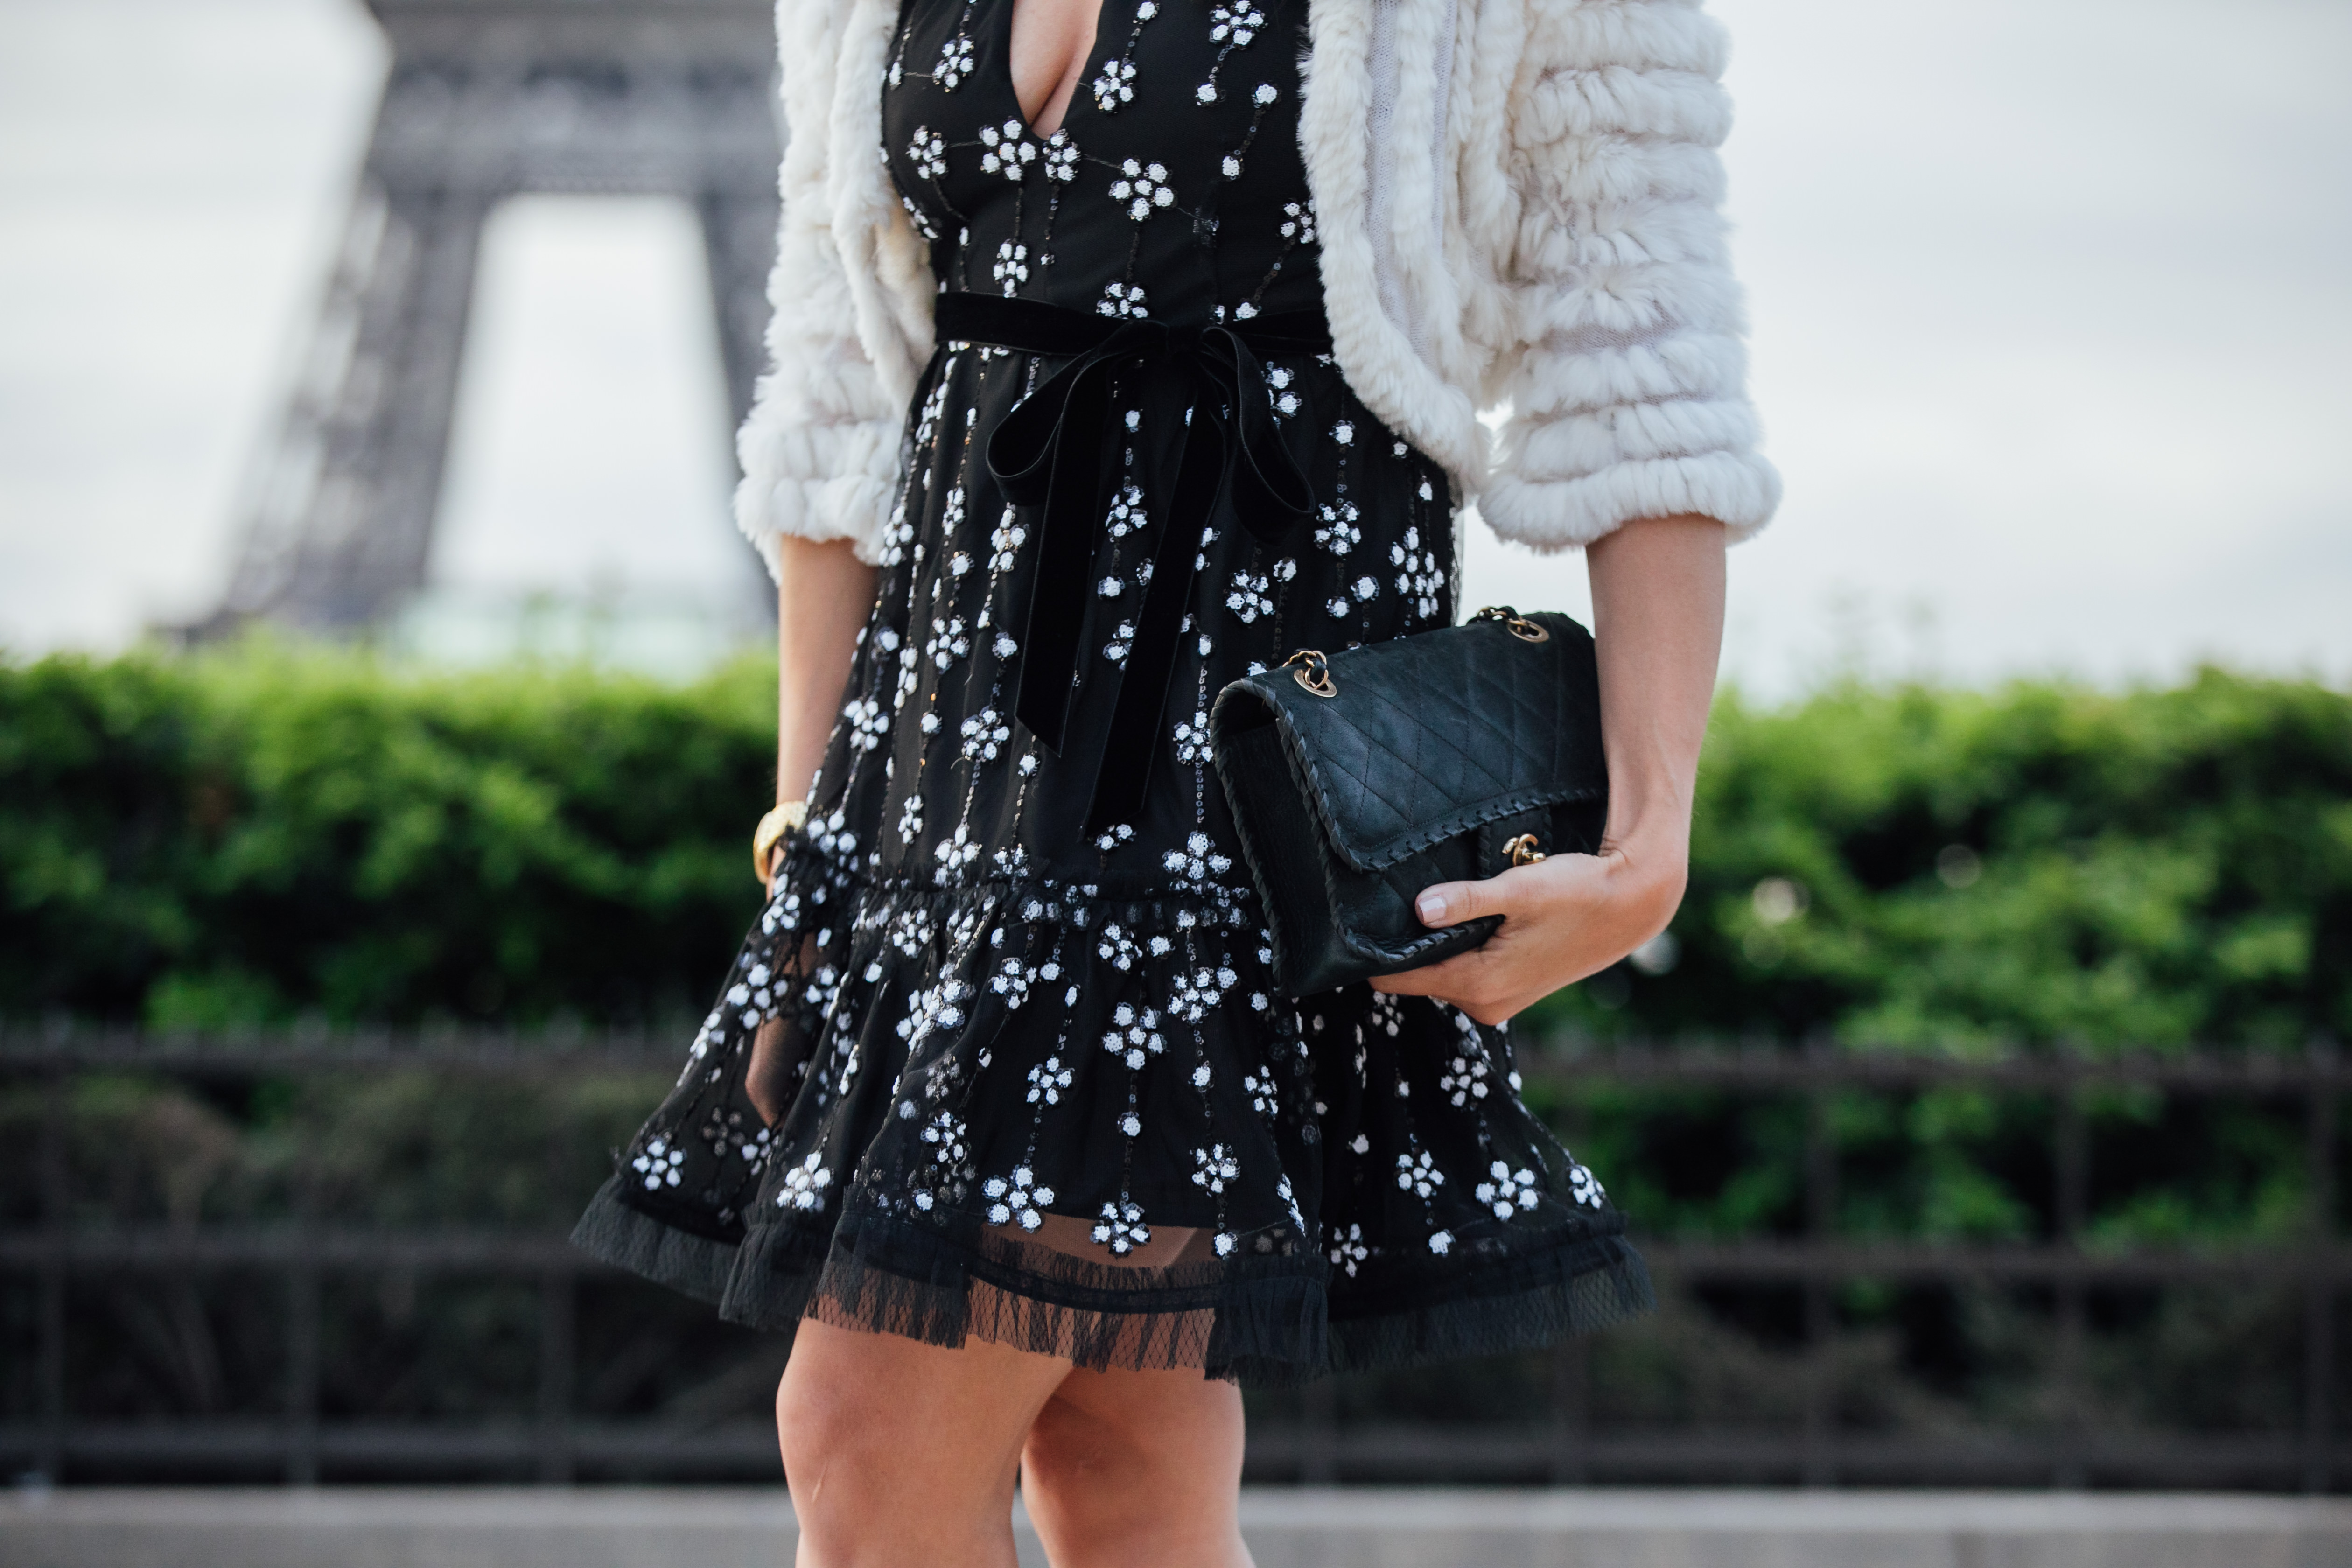 Alexis Poppy dress worn with classic Chanel bag and BCBG fur shrug by Amanda of AGlamLifestyle blog